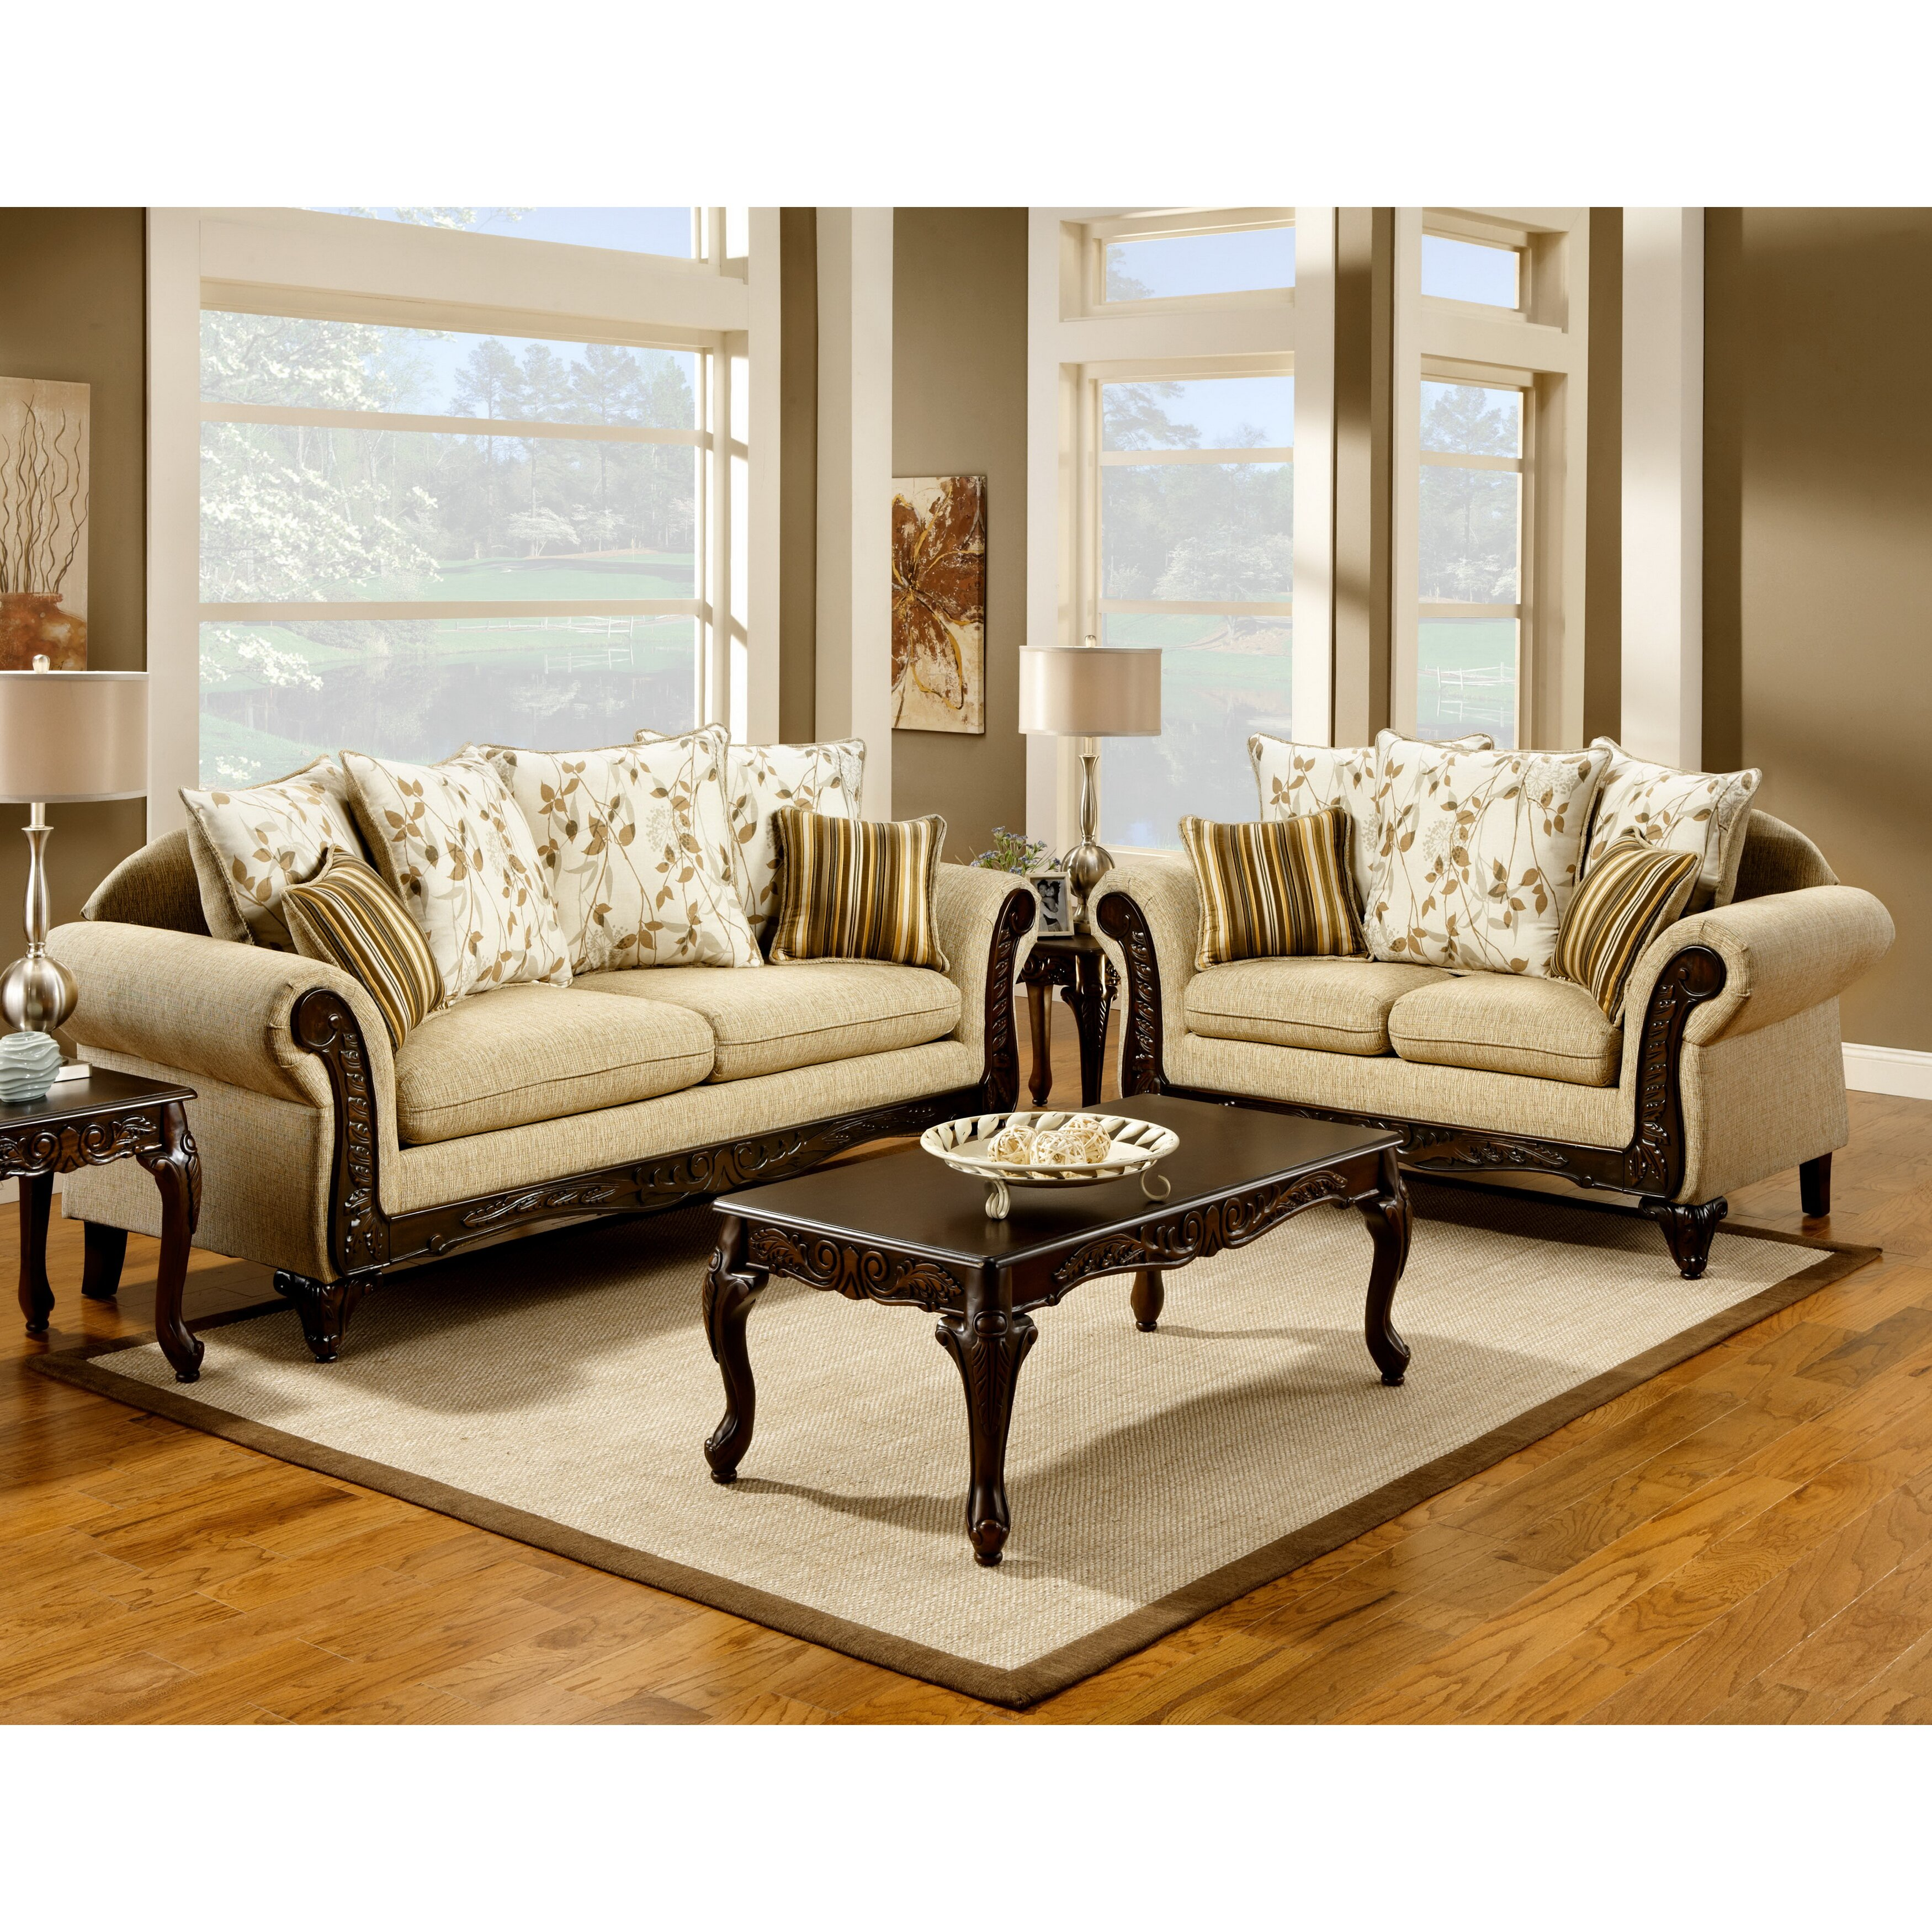 Hokku Designs Aveline Tan Fabric Sofa Set & Reviews